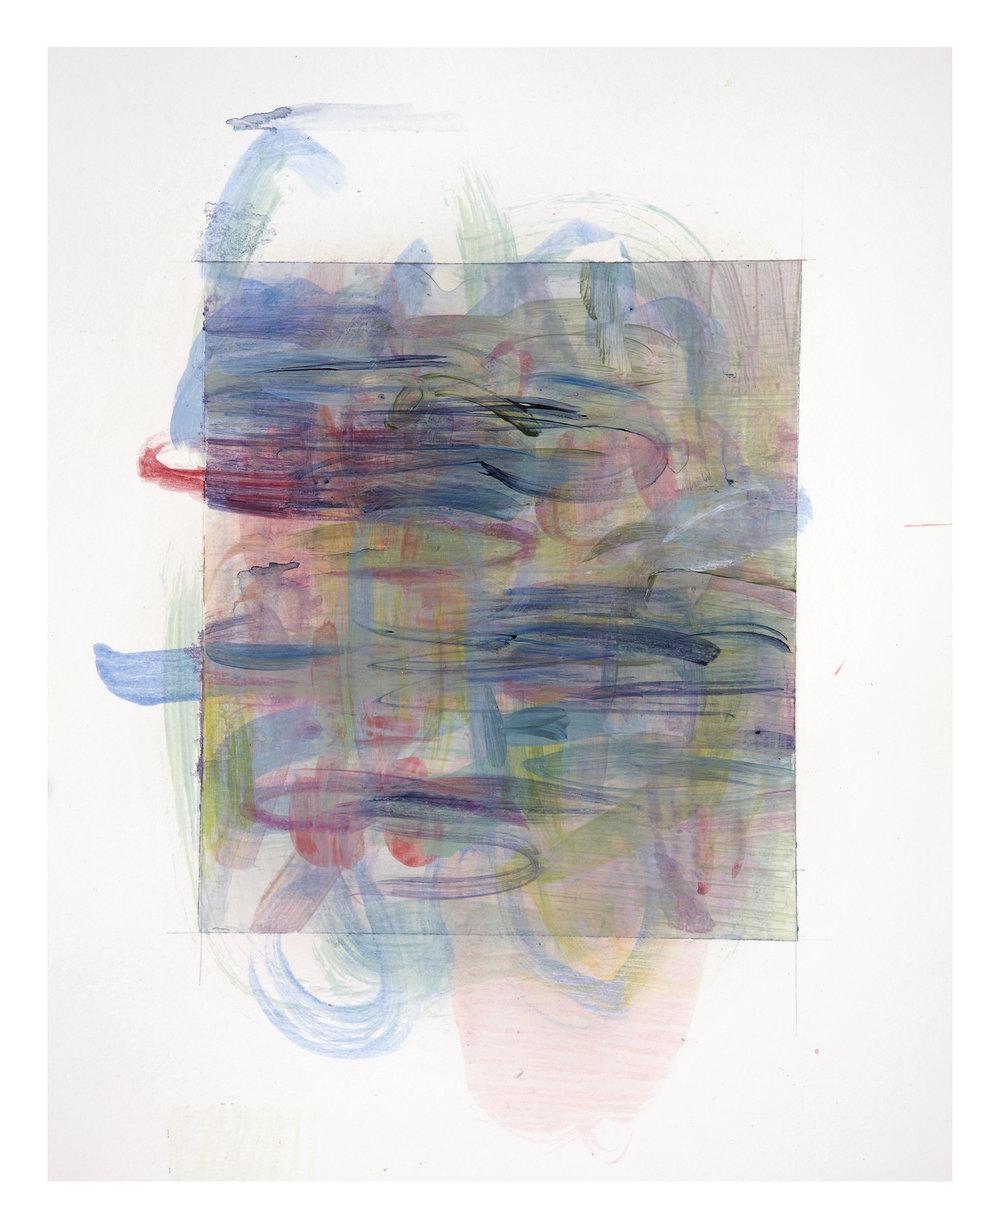 Untitled (1/11/13, #1)